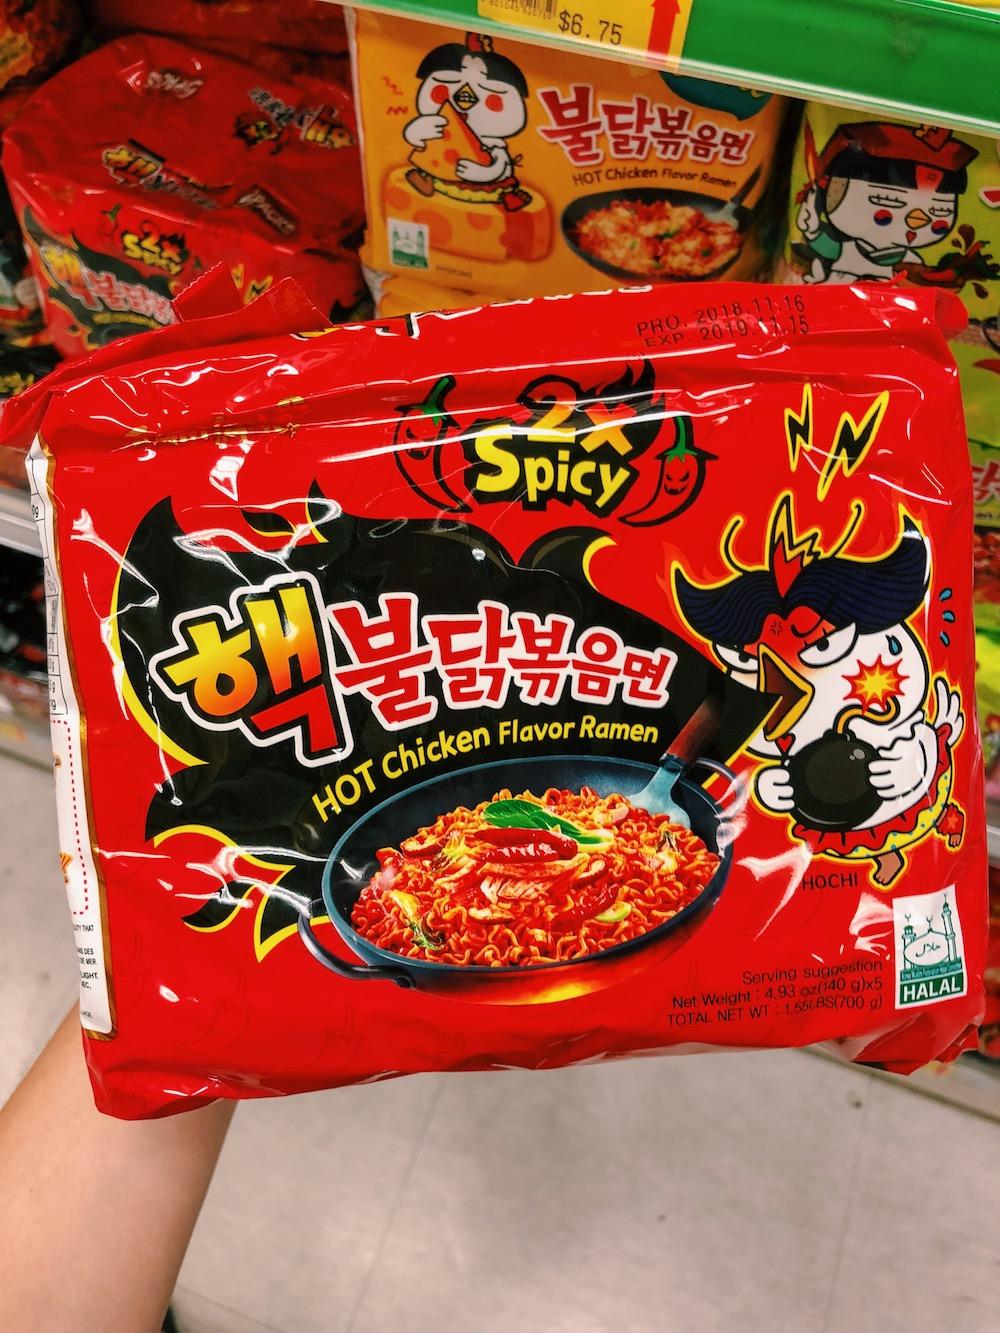 Spicy Ramen Vegan